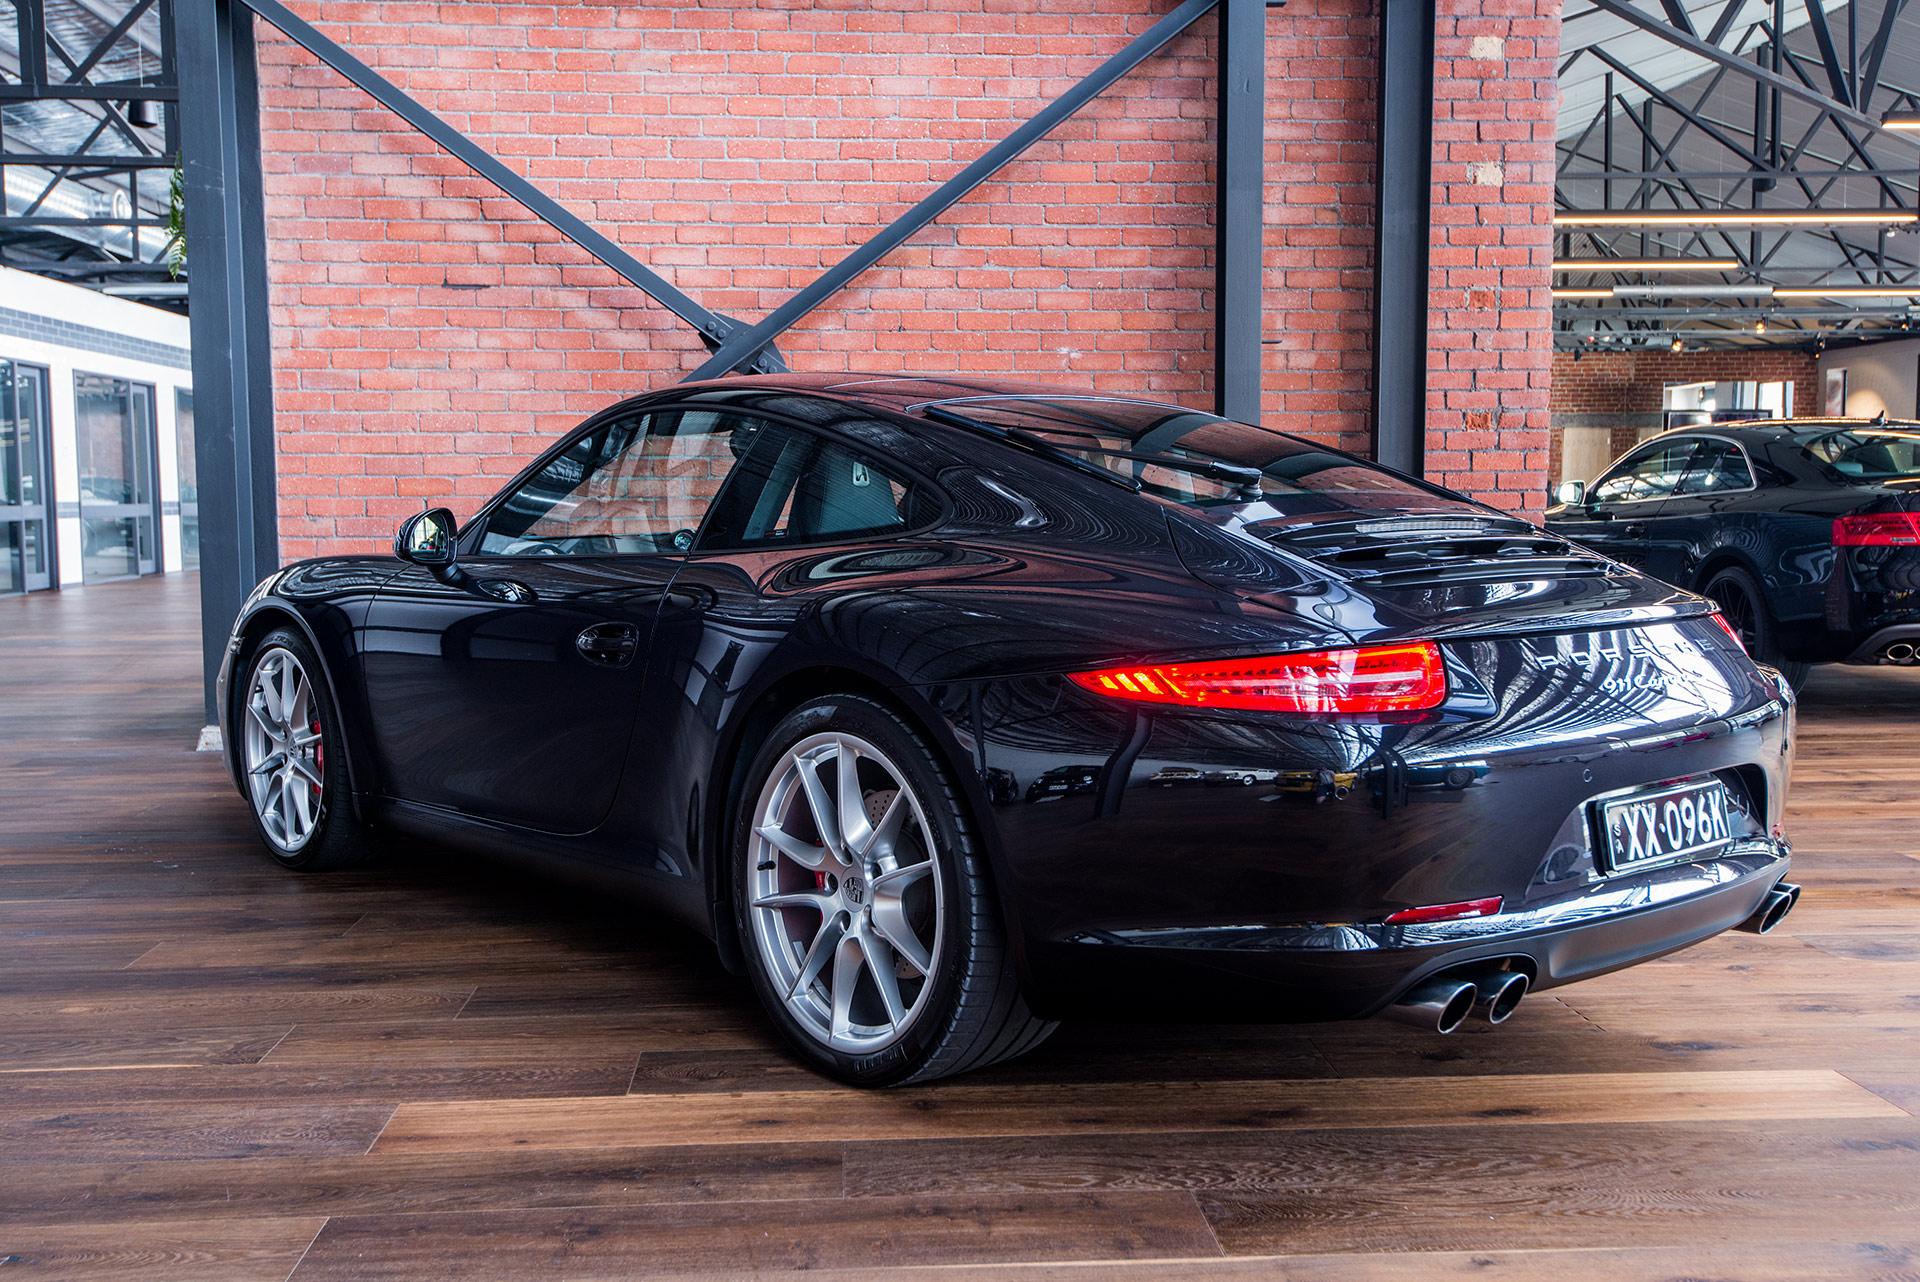 My13 Porsche 911 Carrera S Richmonds Classic And